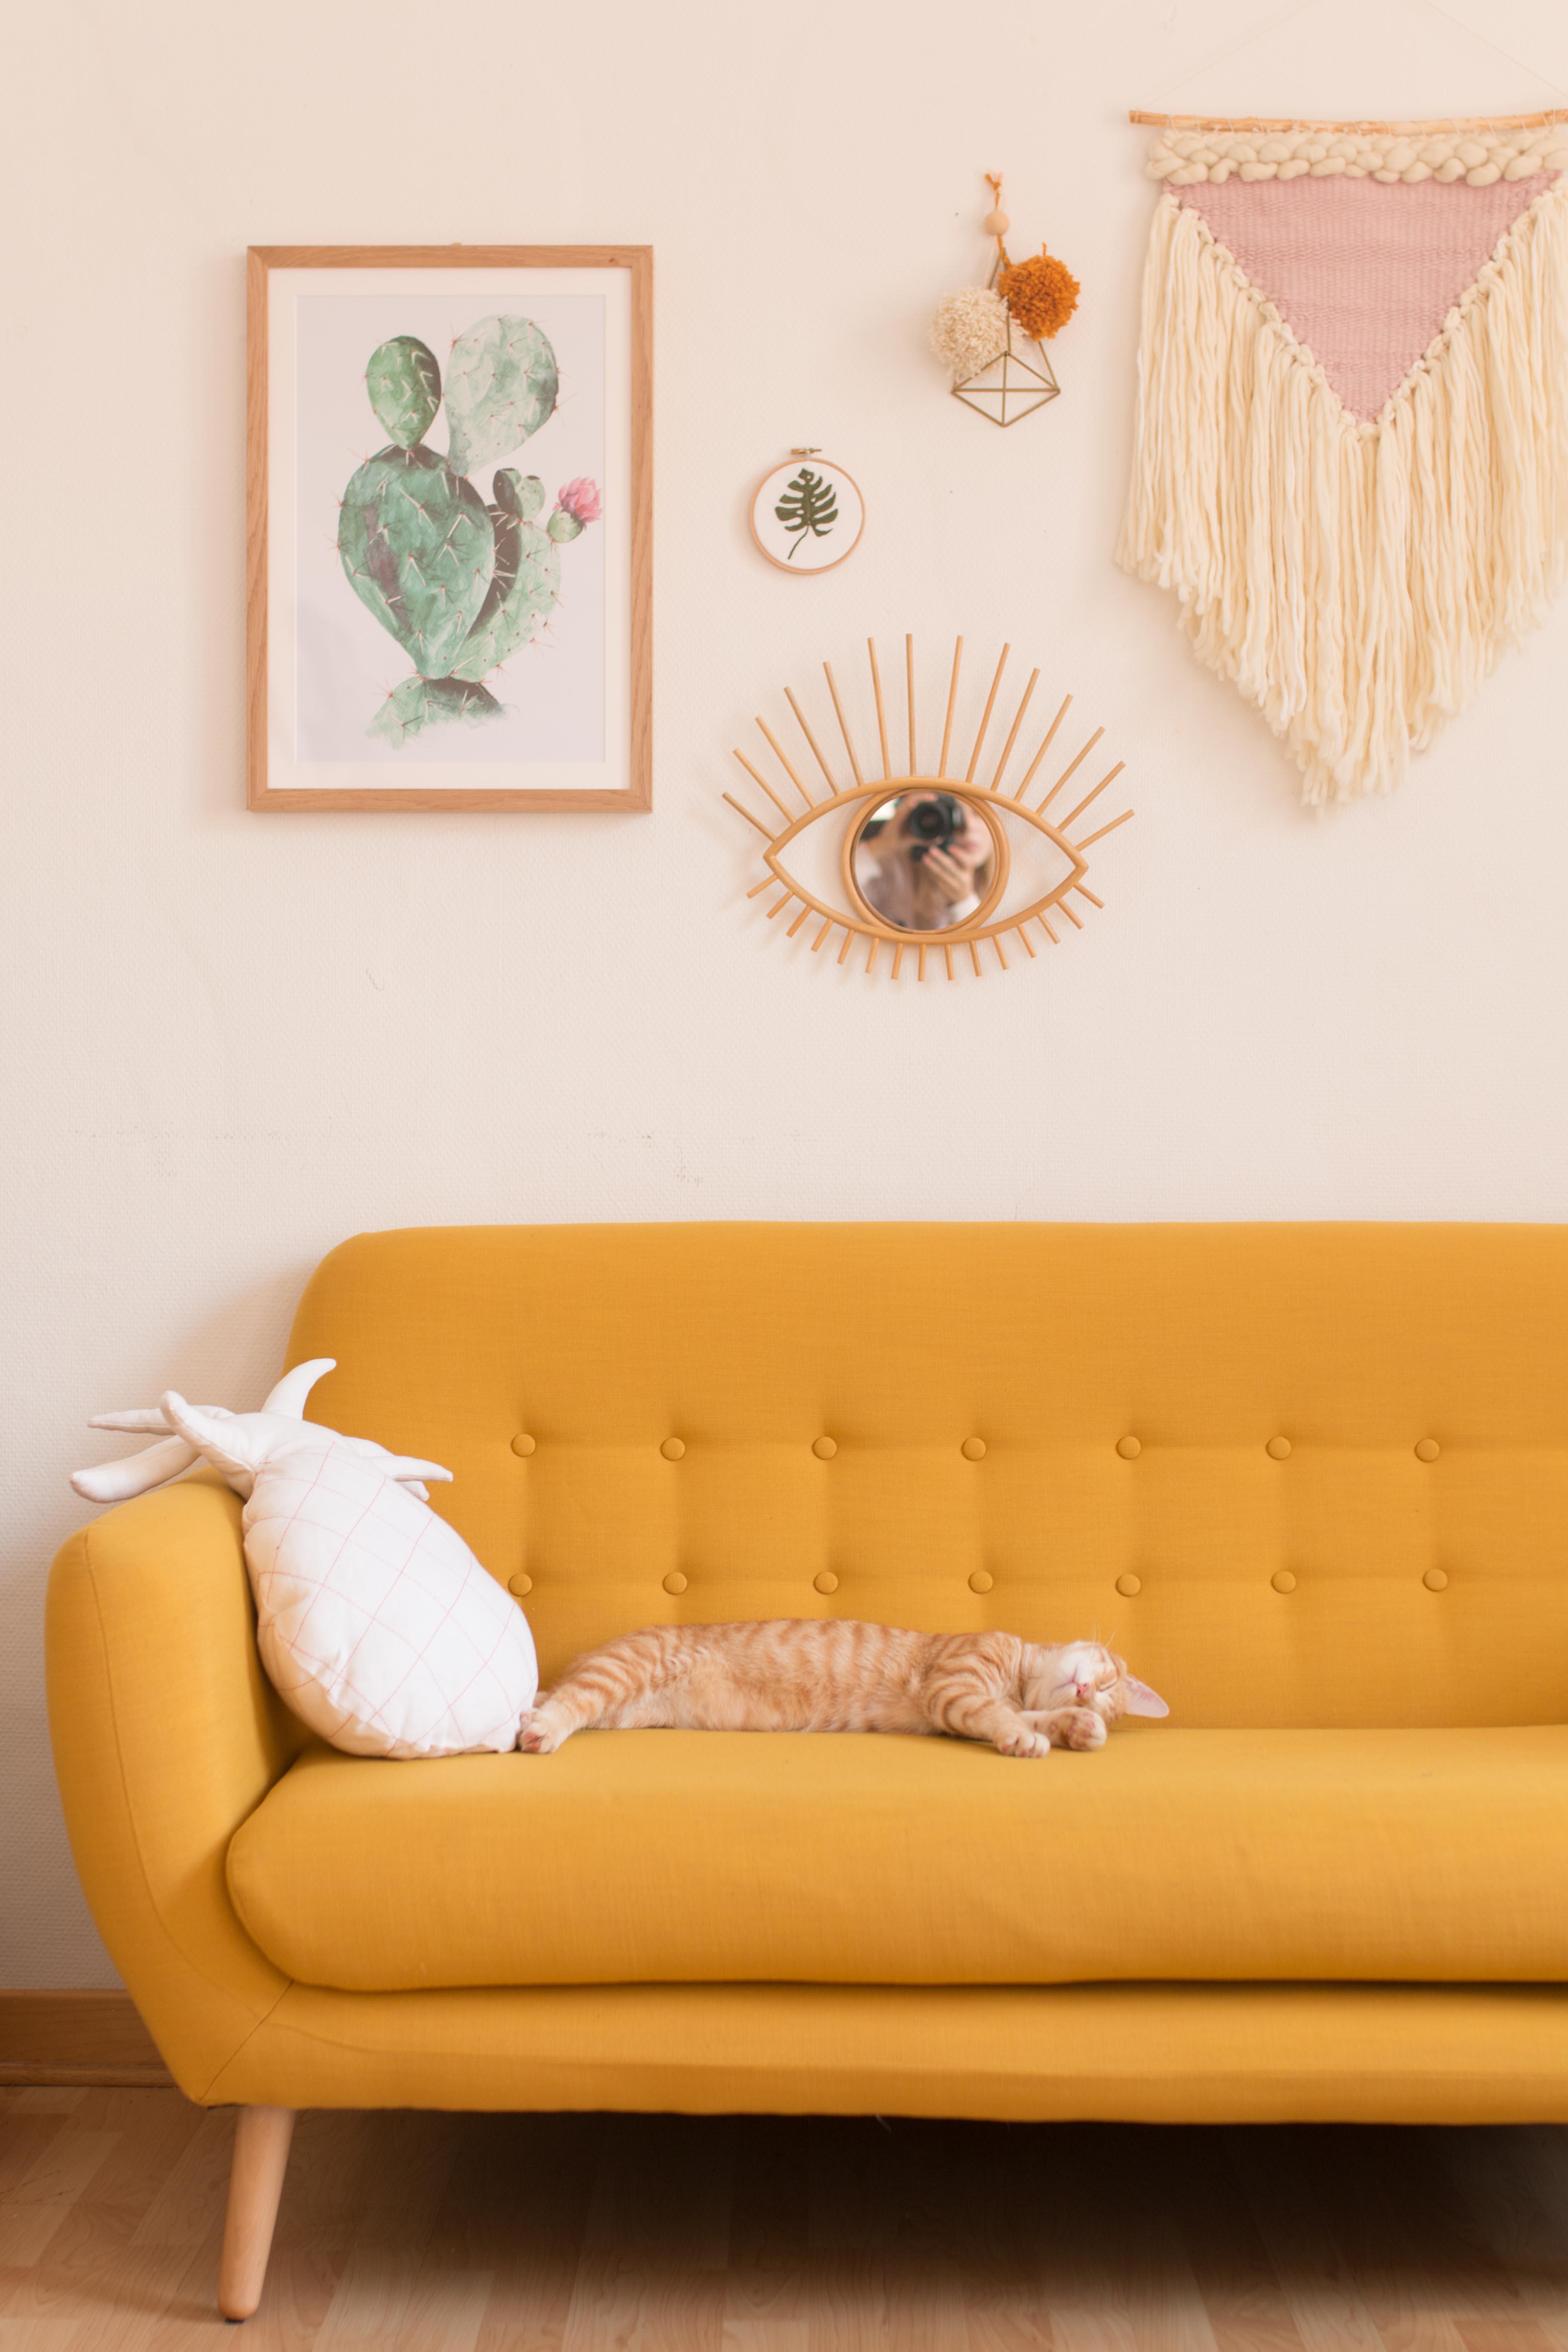 deco-de-mon-salon-home-cute-sweet-home-i-sp4nkblog-14